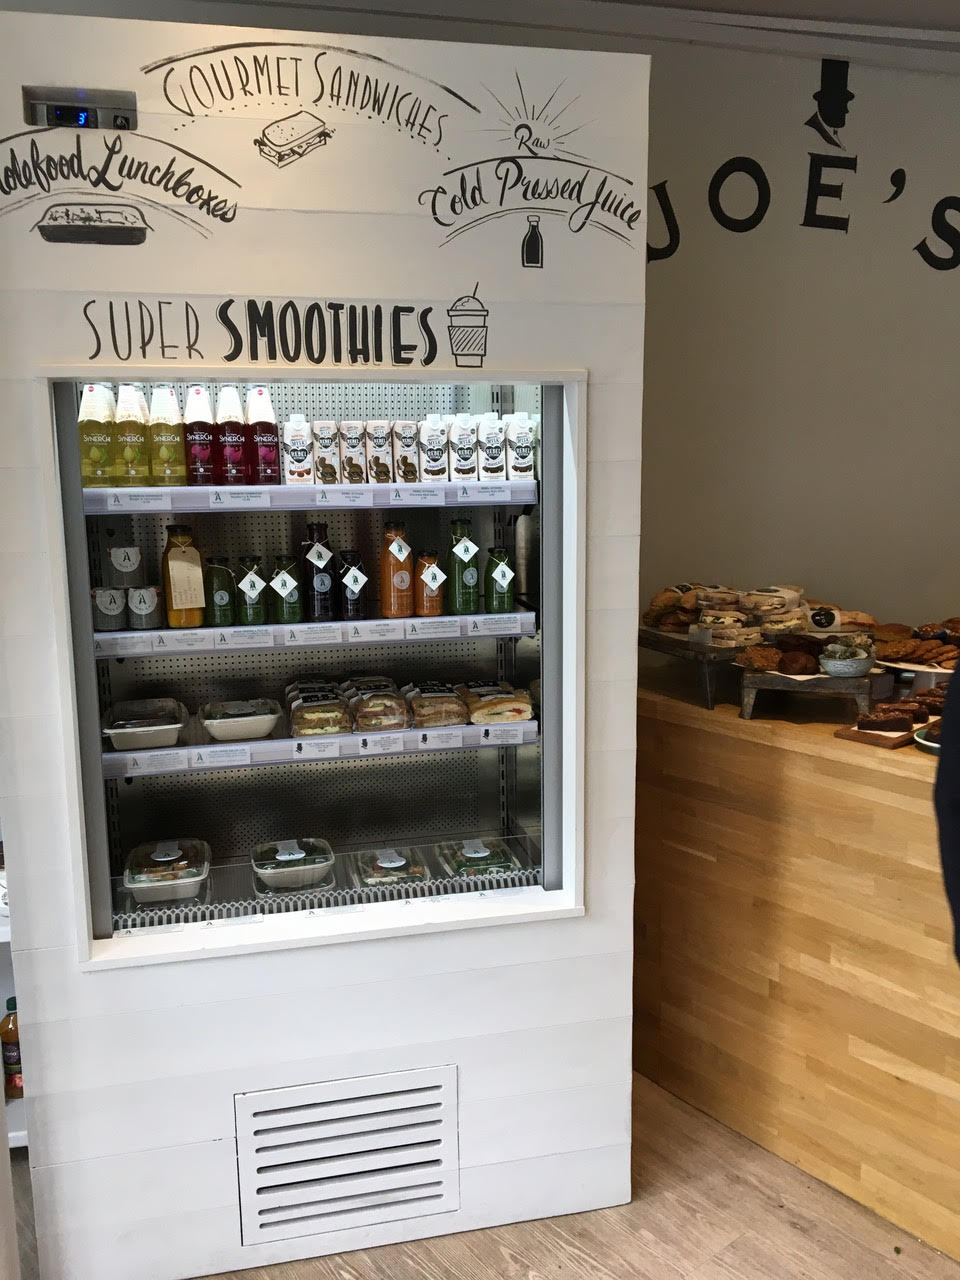 Leeson Street Joe's Specialty Coffee photo 3.jpg